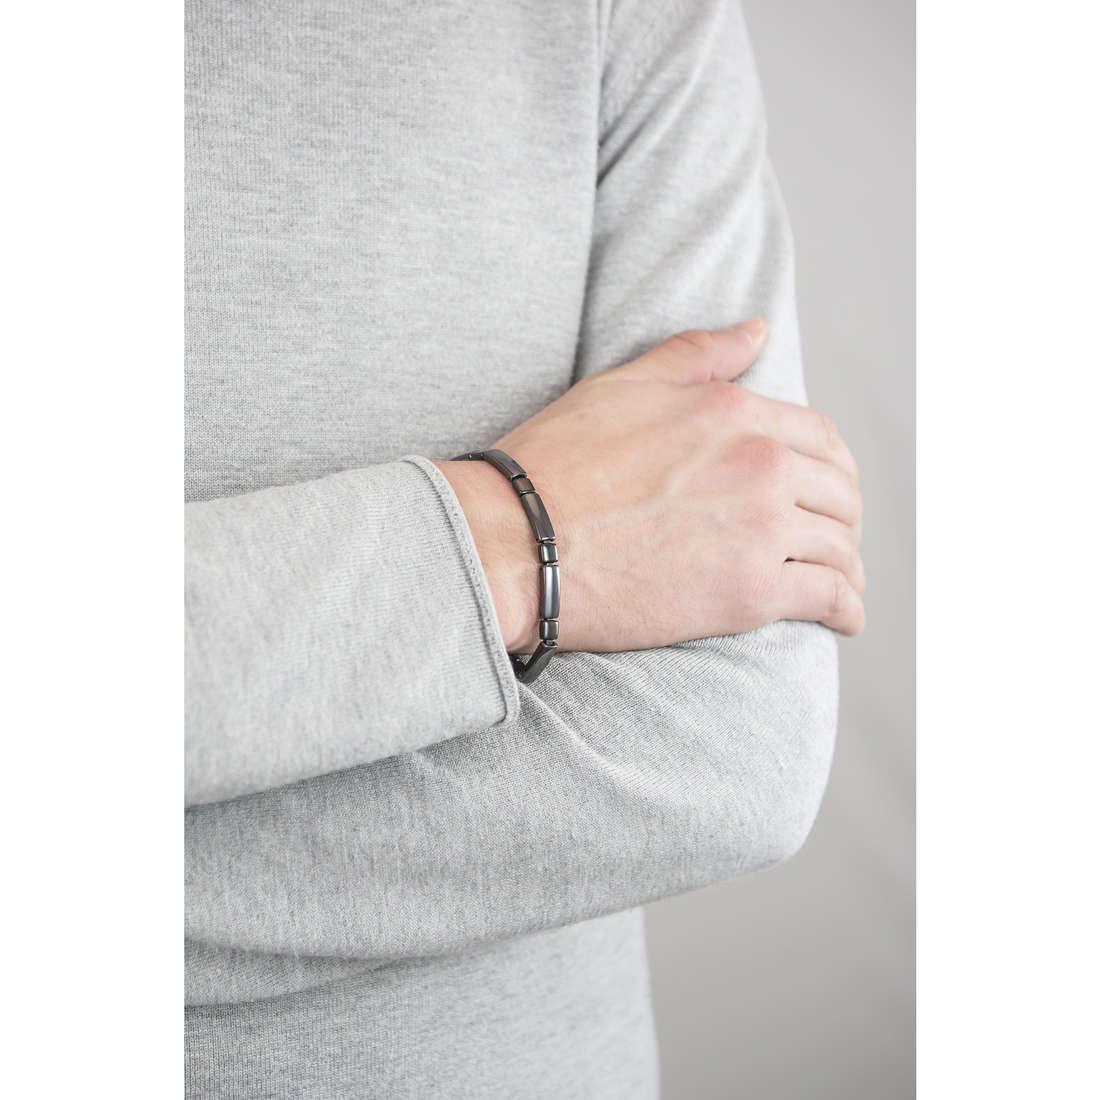 Sector bracciali Ceramic uomo SAFR04 indosso